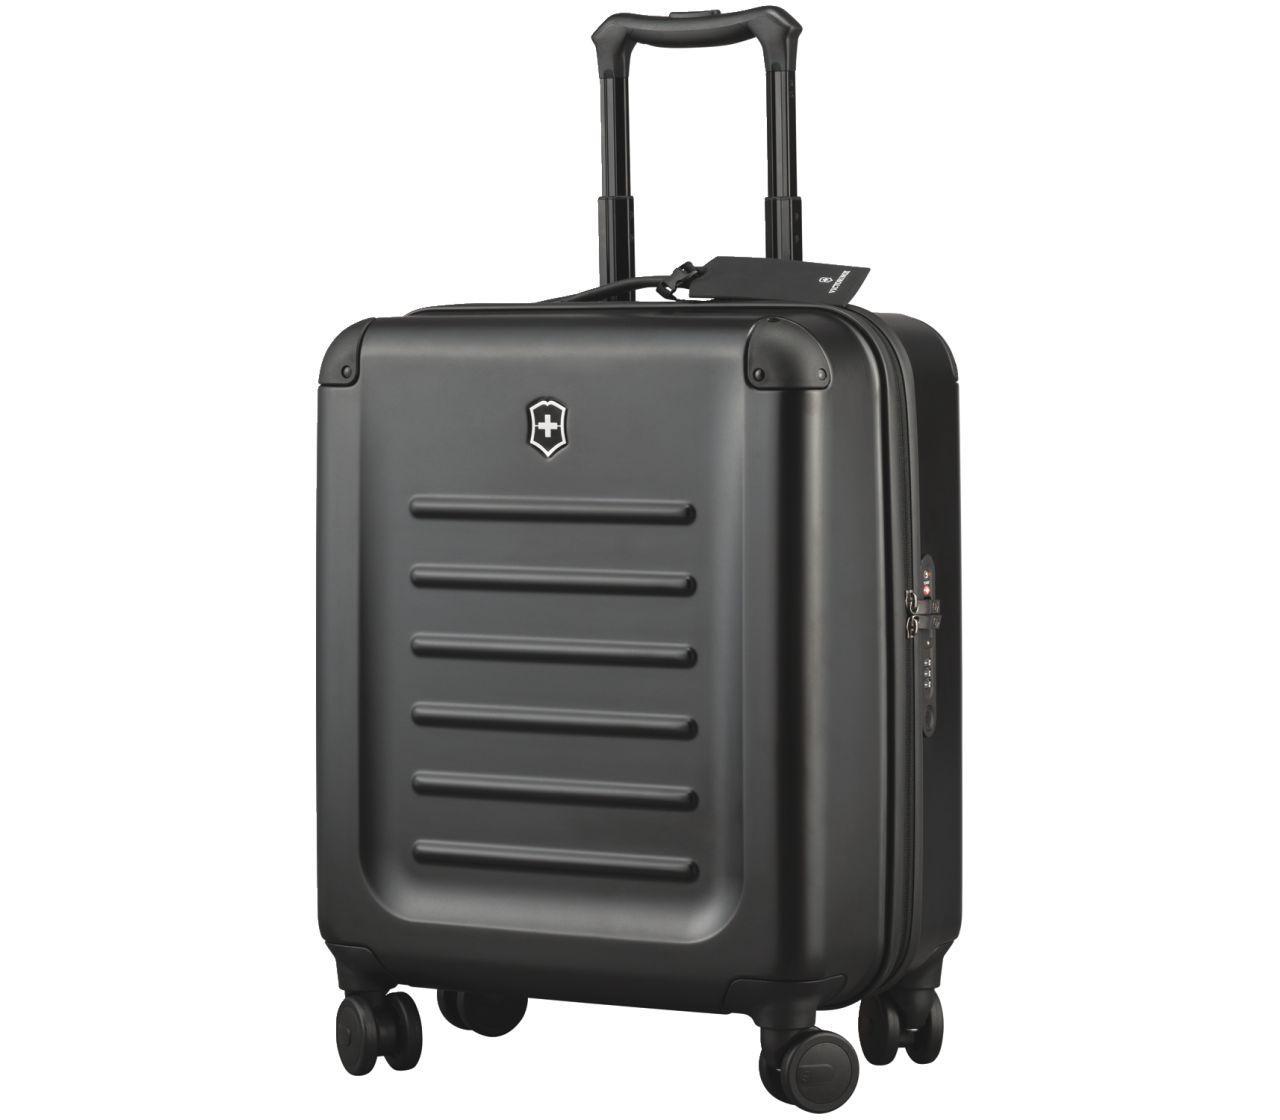 Maleta Victorinox Spectra 2.0, Extra-Capacity Carry-On 31318301 *